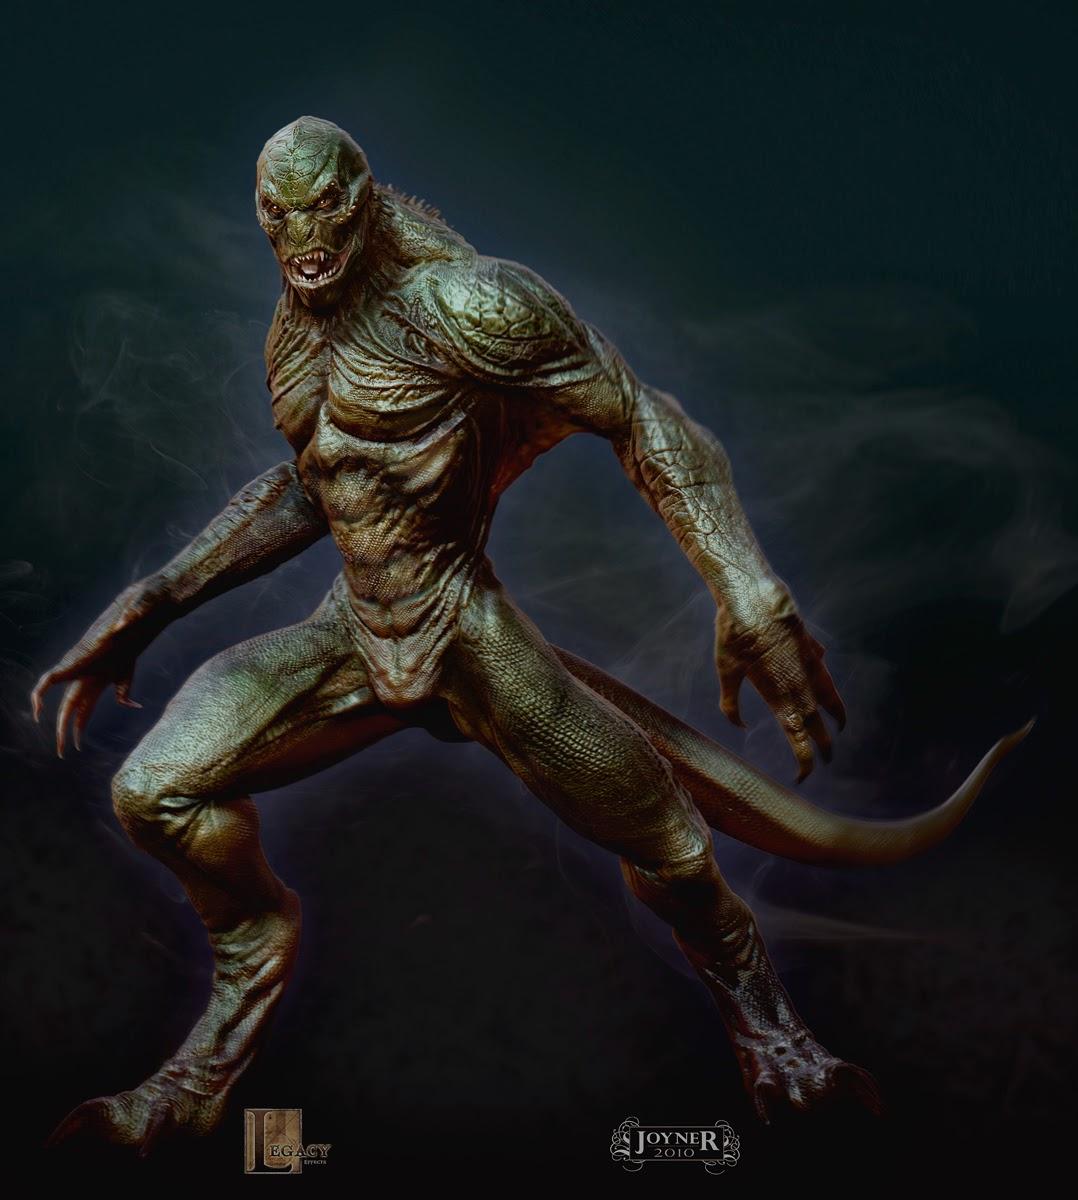 Beautiful Wallpaper Marvel Lizard - latest?cb\u003d20141030000305  You Should Have_113615.jpg/revision/latest?cb\u003d20141030000305